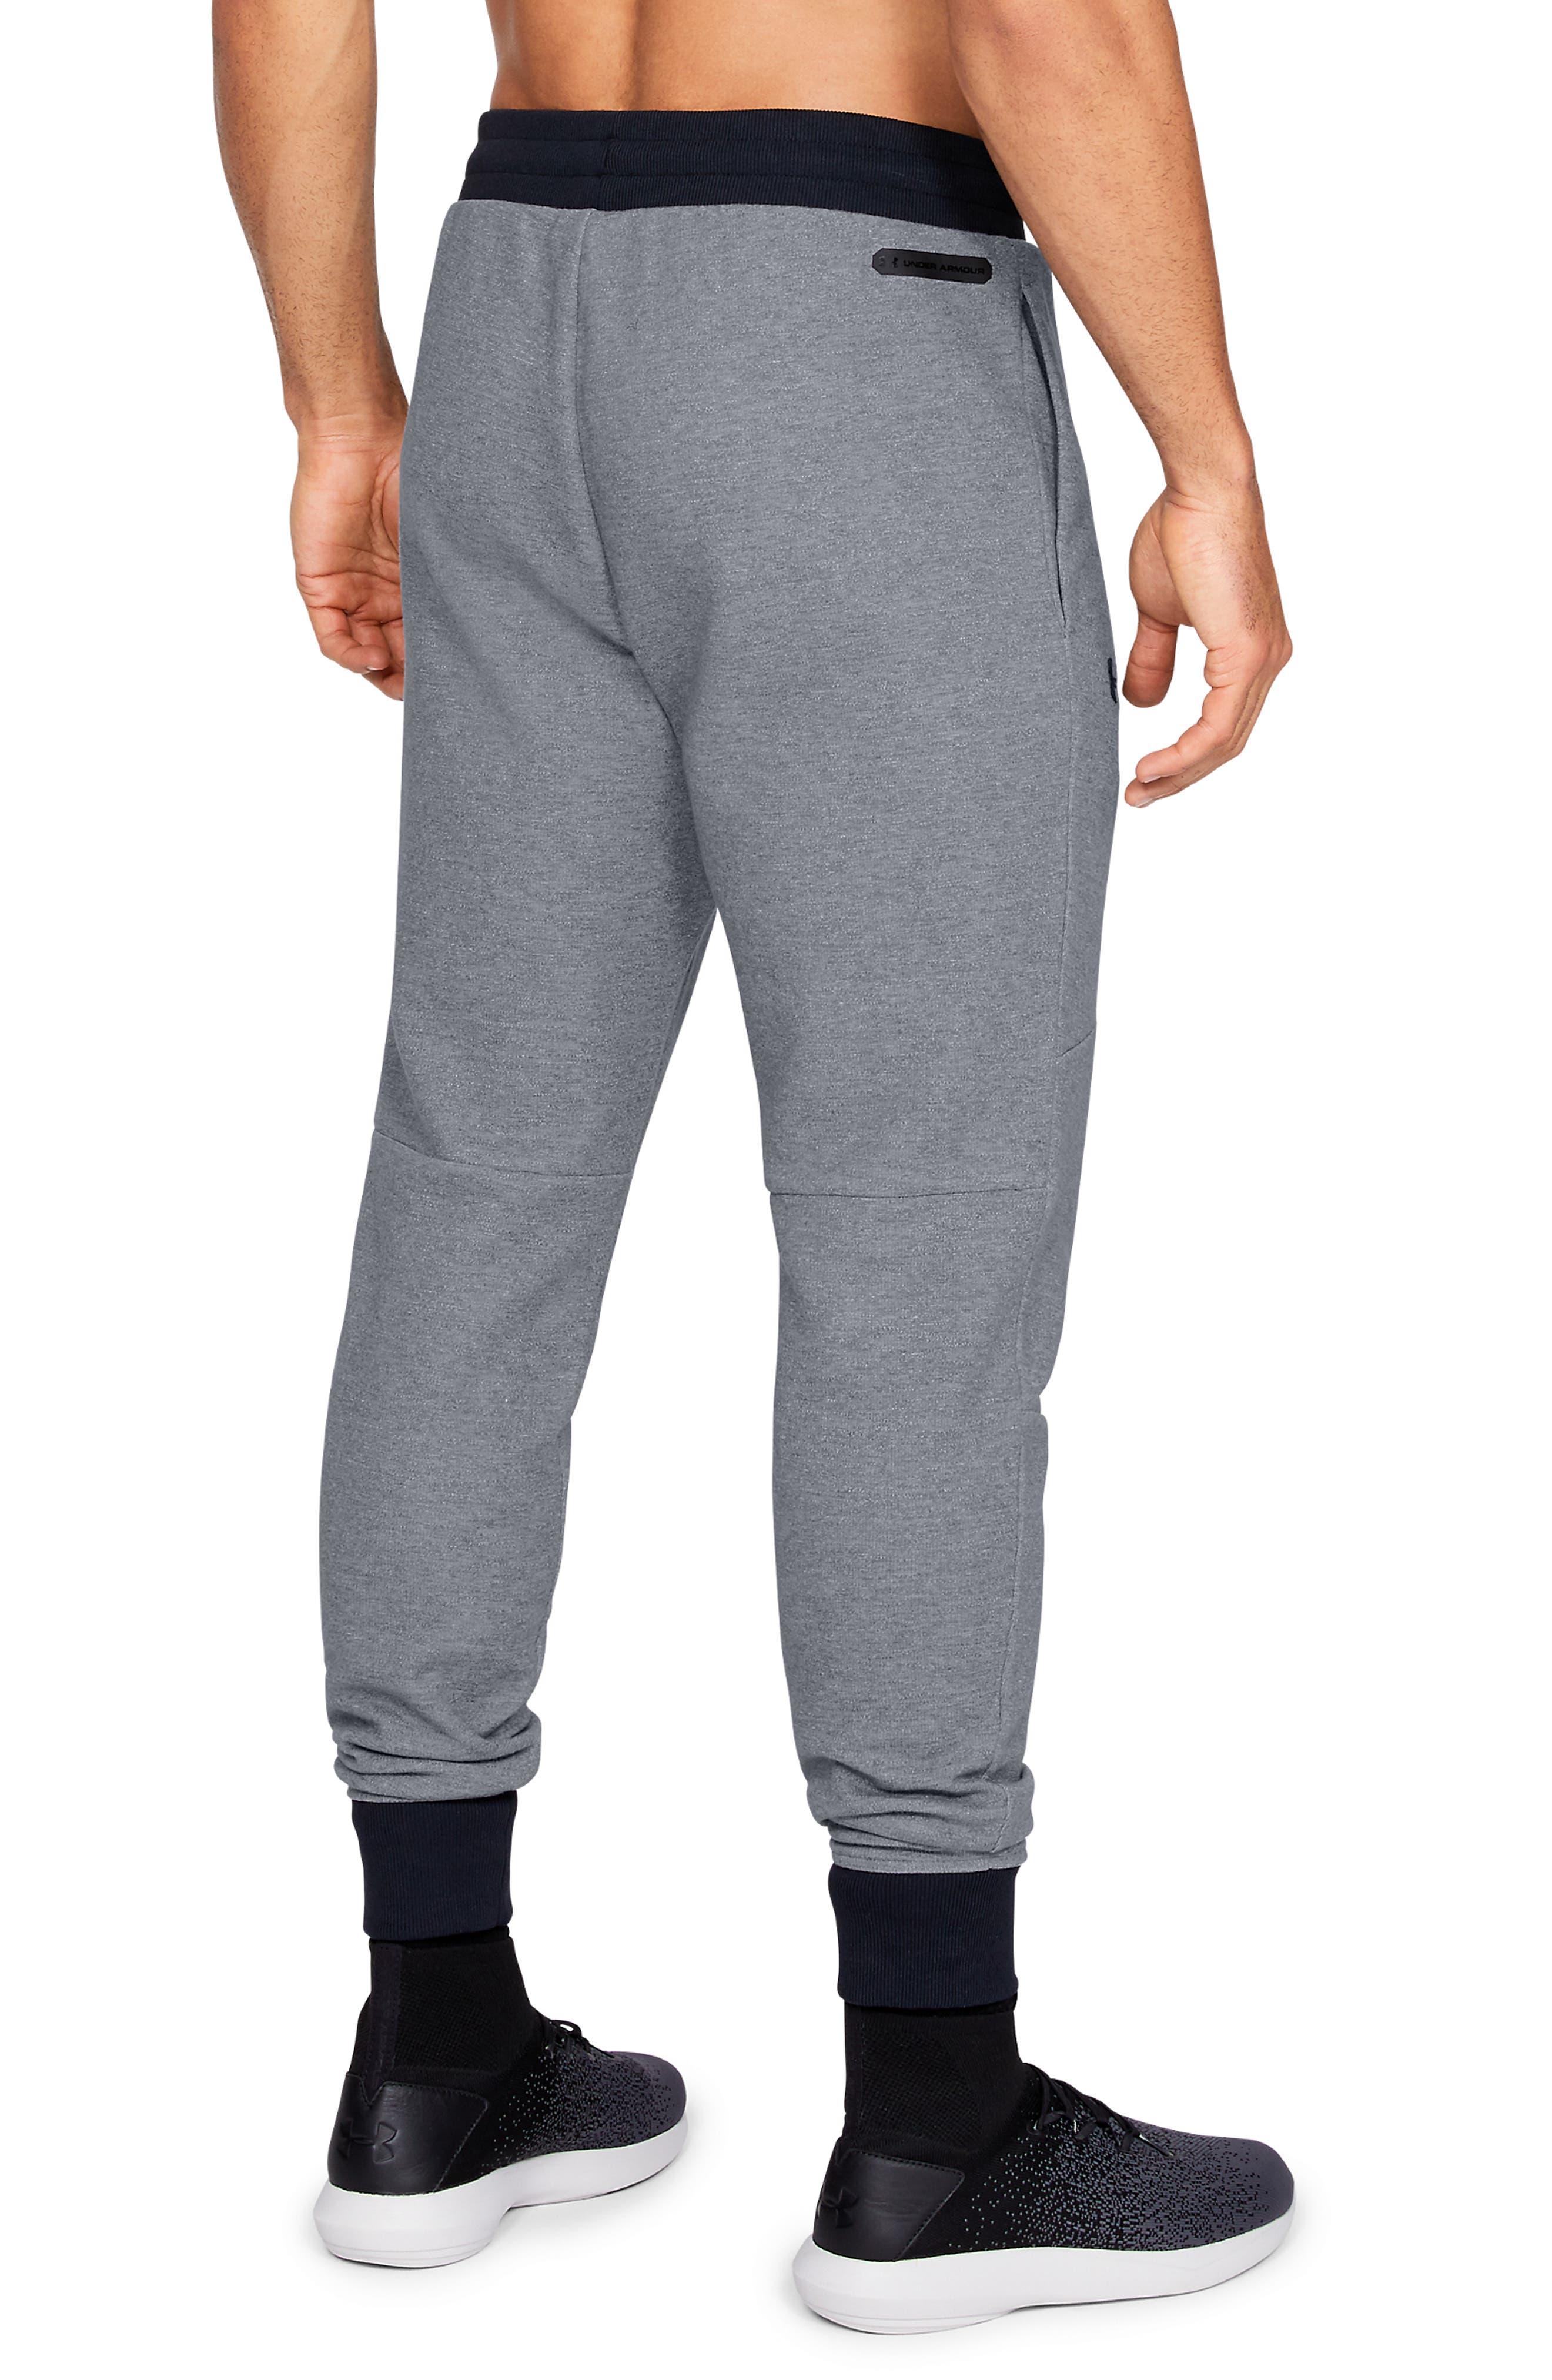 Unstoppable Double Knit Jogger Pants,                             Alternate thumbnail 2, color,                             STEEL